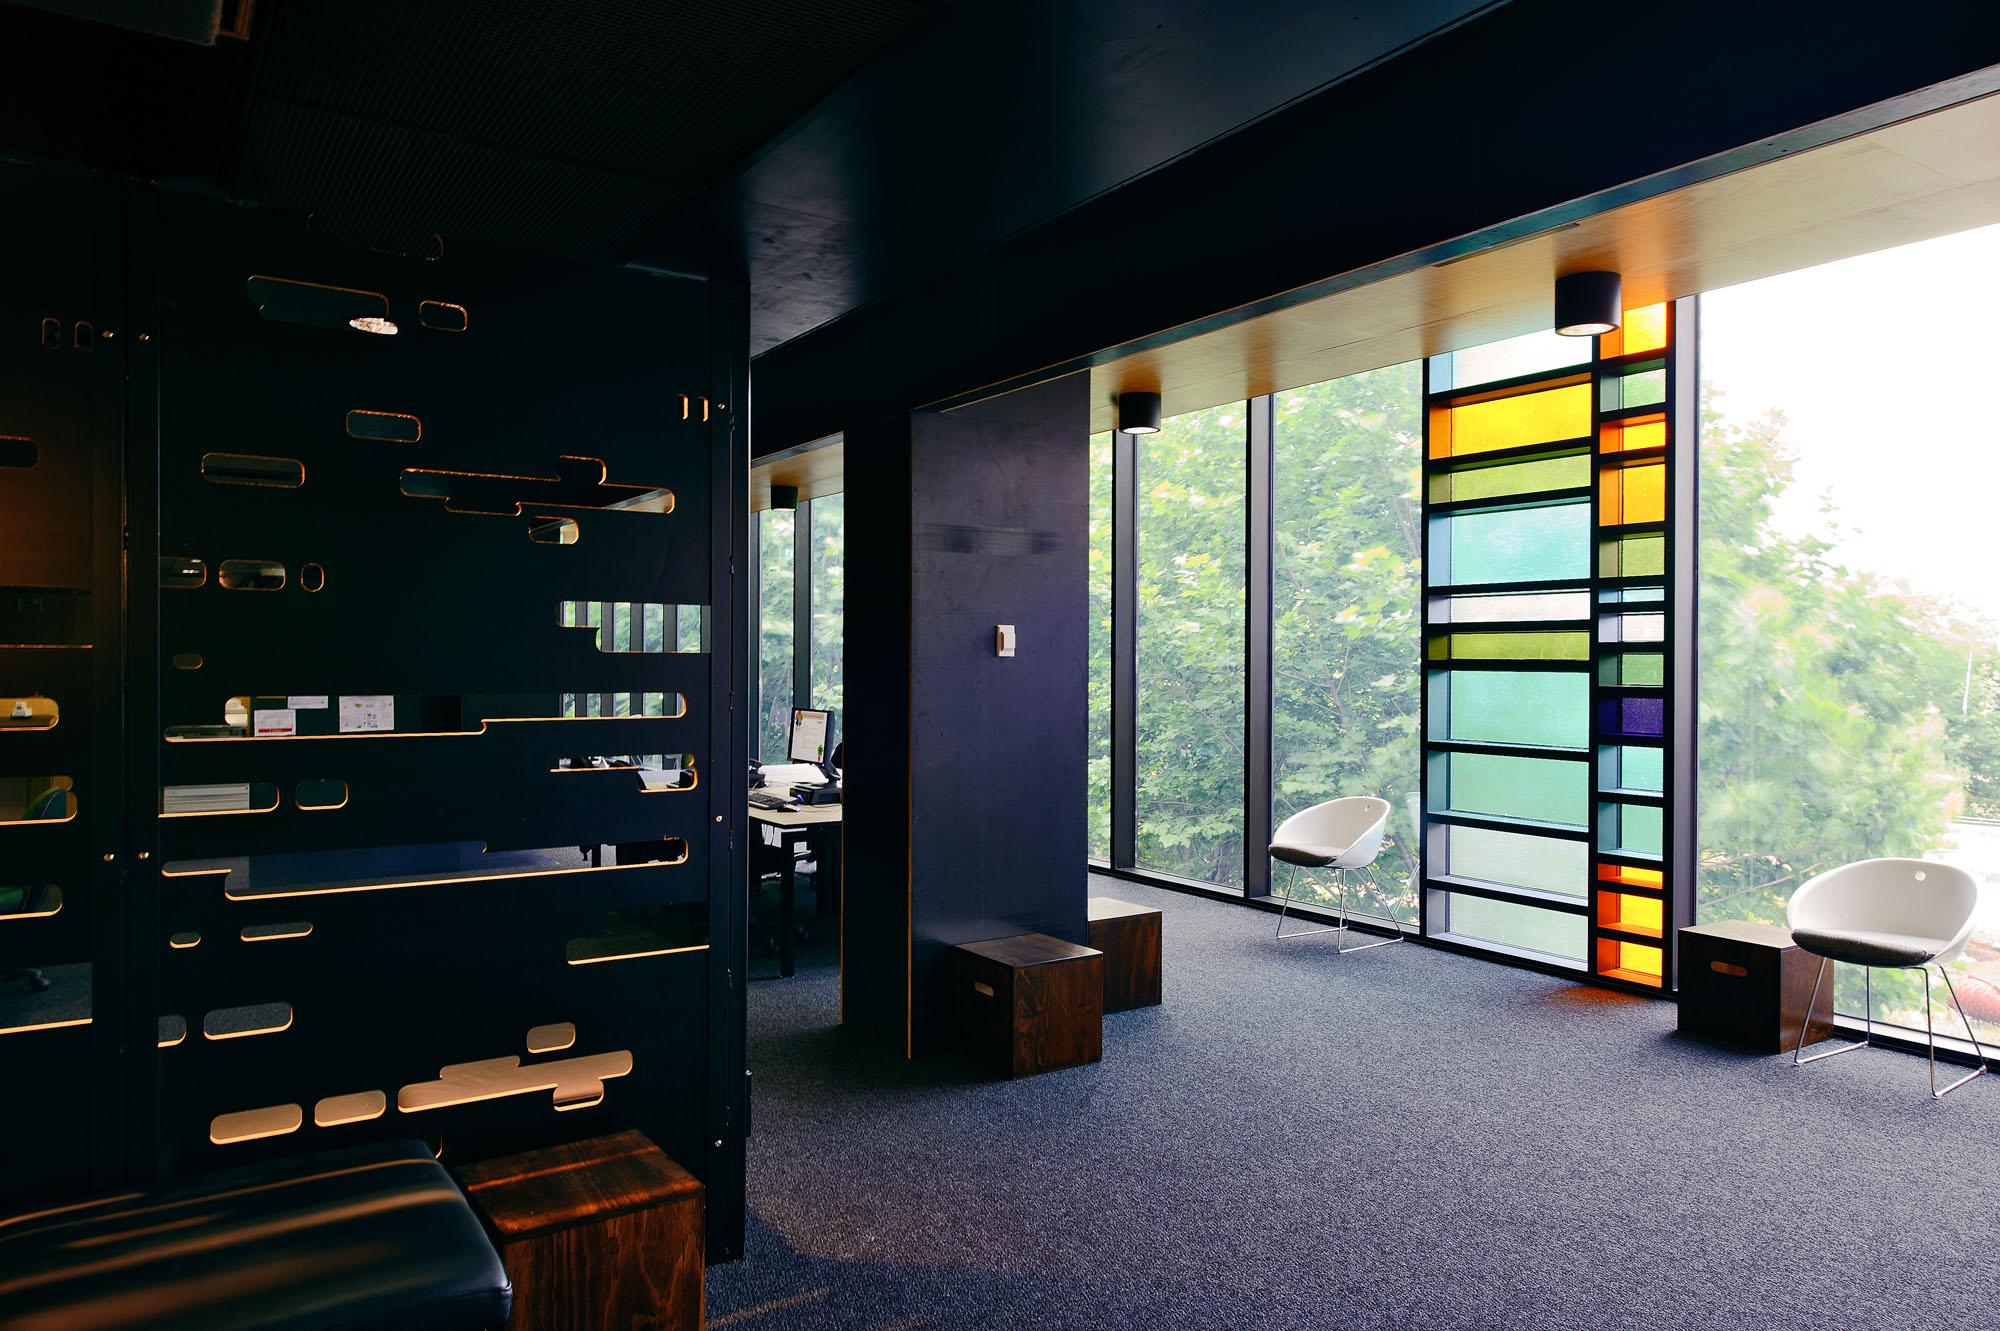 Deakin Waurn Ponds Library-03-PRodriguez_LRWeb.jpg